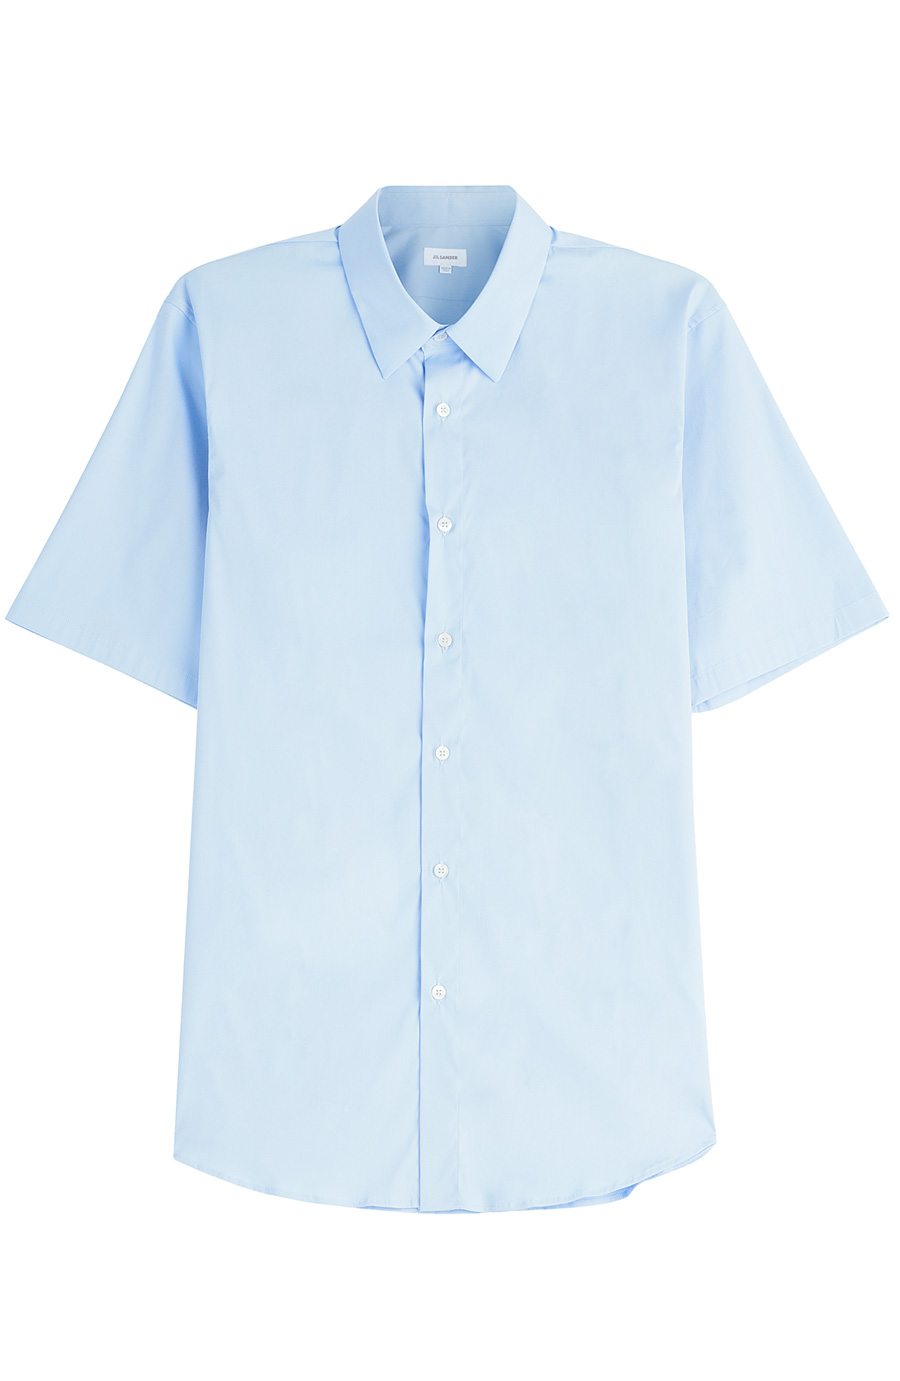 Jil Sander Short Sleeve Cotton Shirt In Blue